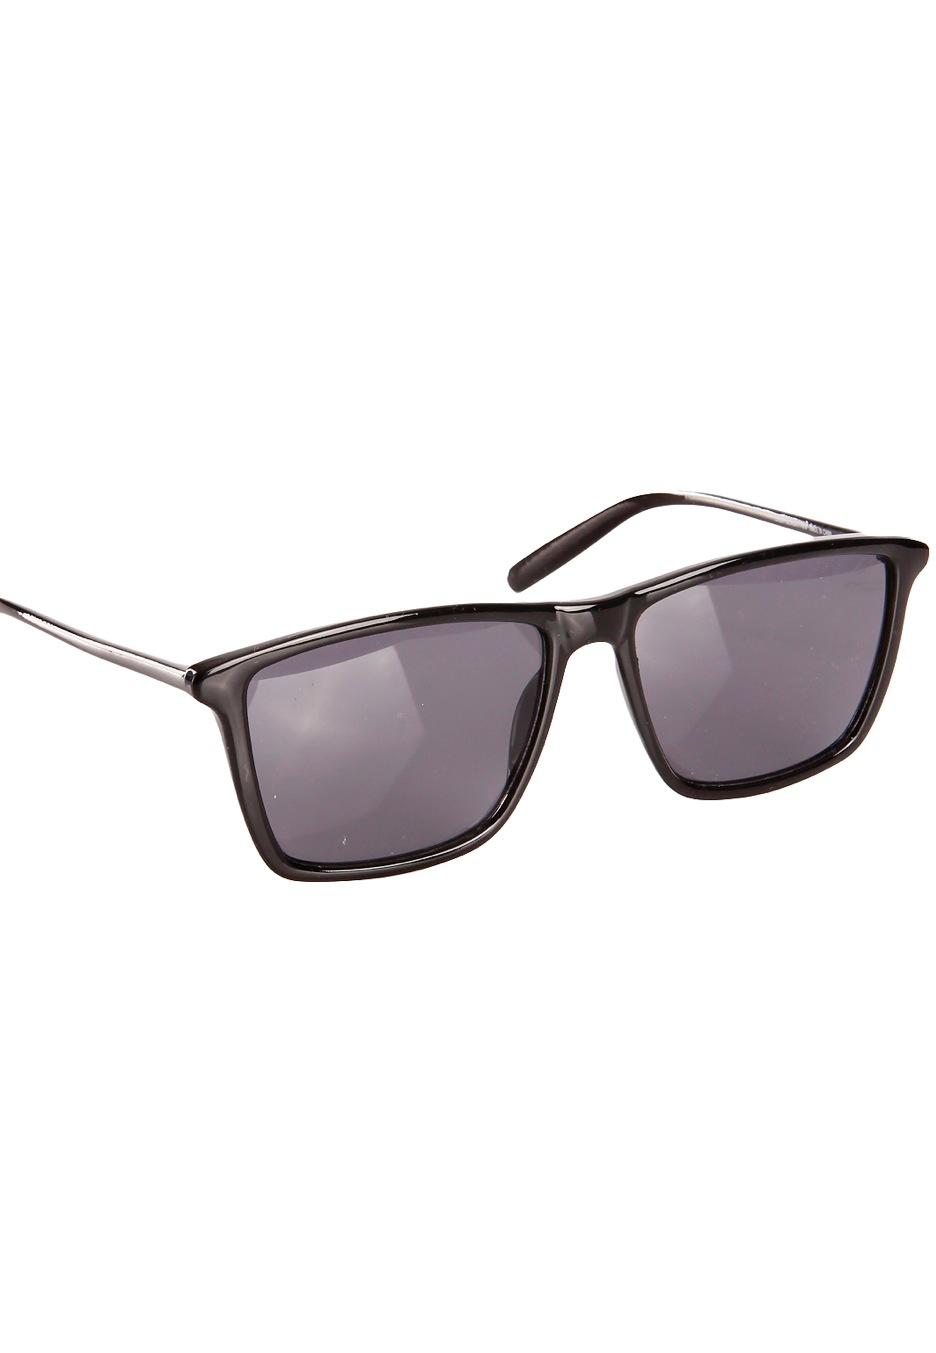 cheap monday mars sunglasses uk. Black Bedroom Furniture Sets. Home Design Ideas